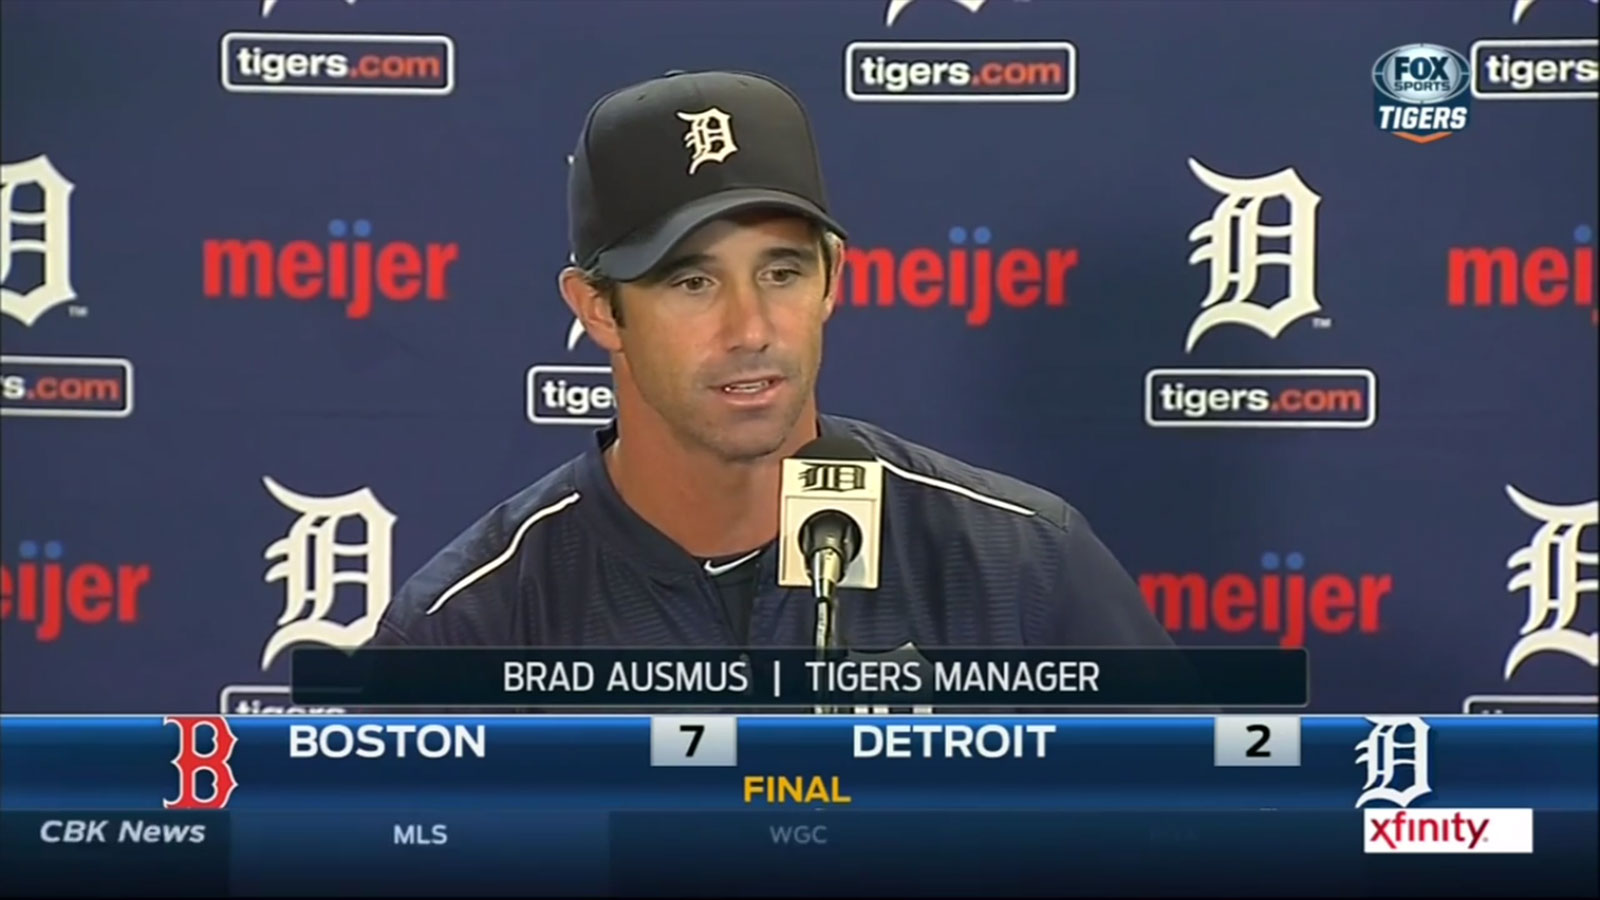 Tigers Postgame 8.7.15: Brad Ausmus (VIDEO)